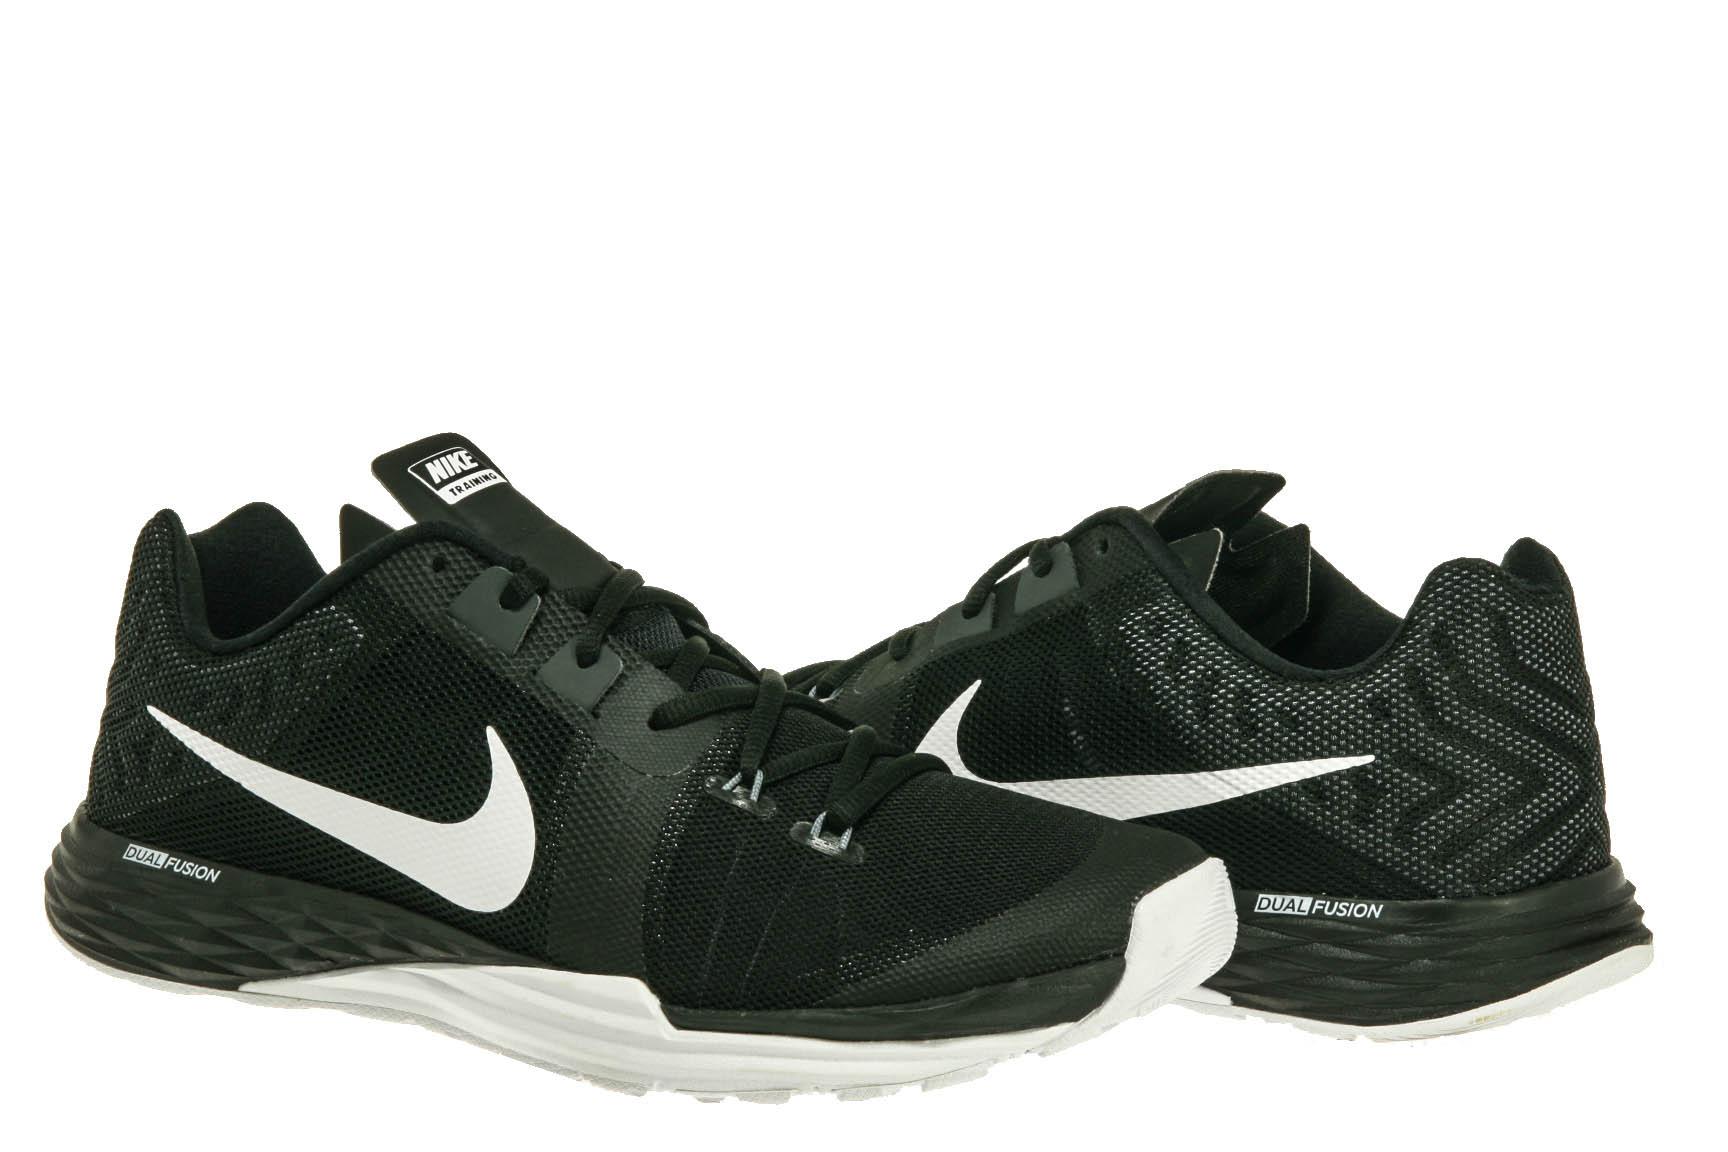 premium selection 7678d 2f61d Buty Męskie Nike TRAIN PRIME IRON 832219 001 42.5 - 7303526133 ...